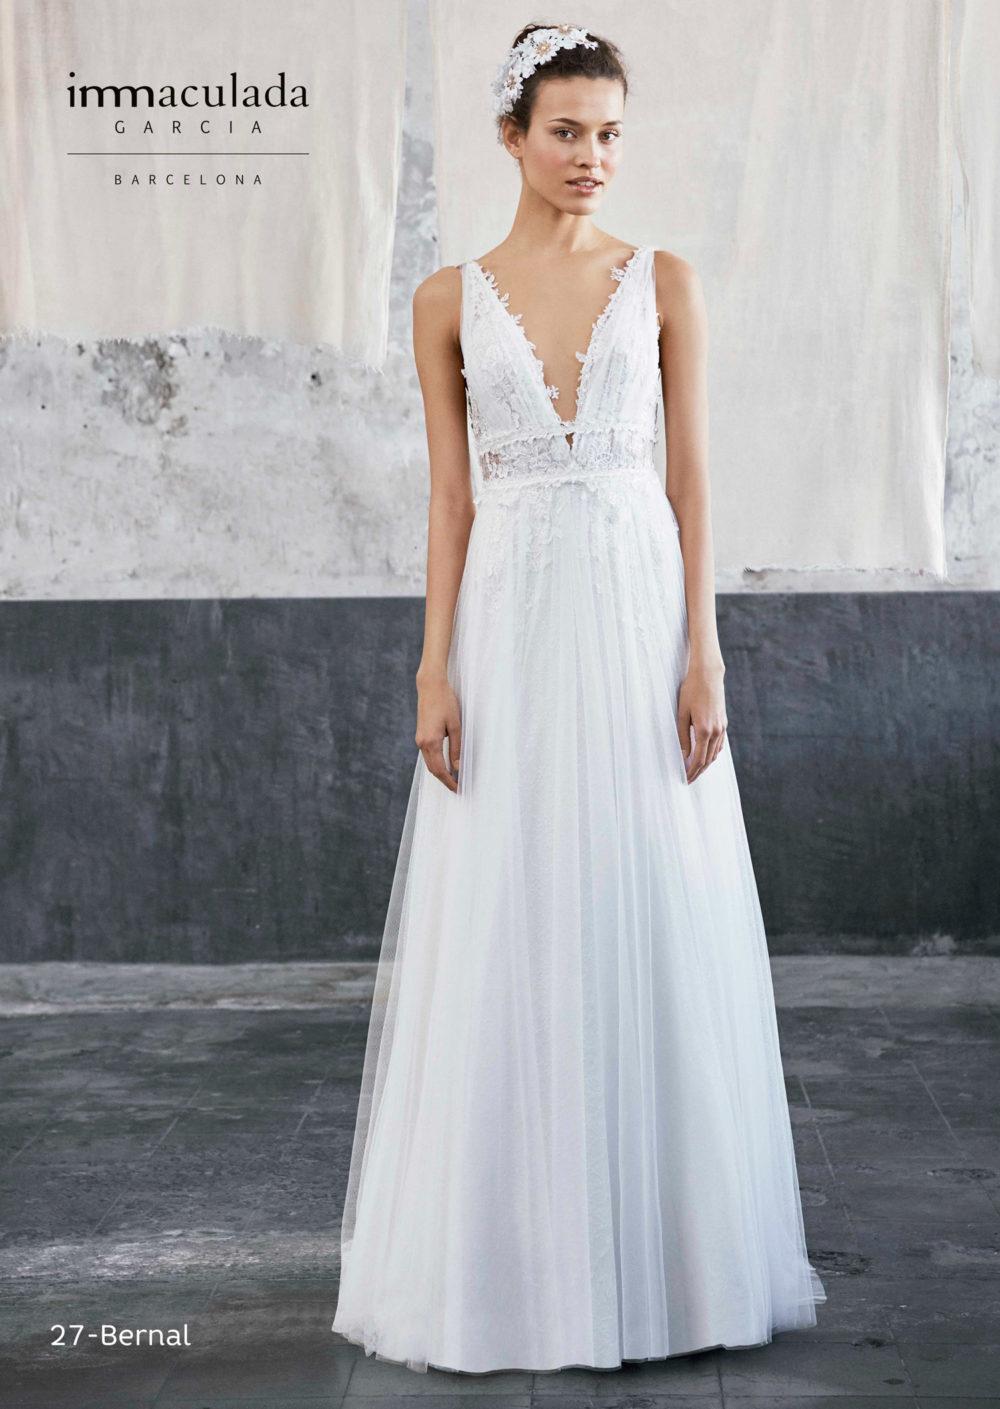 Mariages: abito da sposa Immaculada Garcia Barcelona 2020 a Vicenza, Verona, Padova, Veneto BERNAL